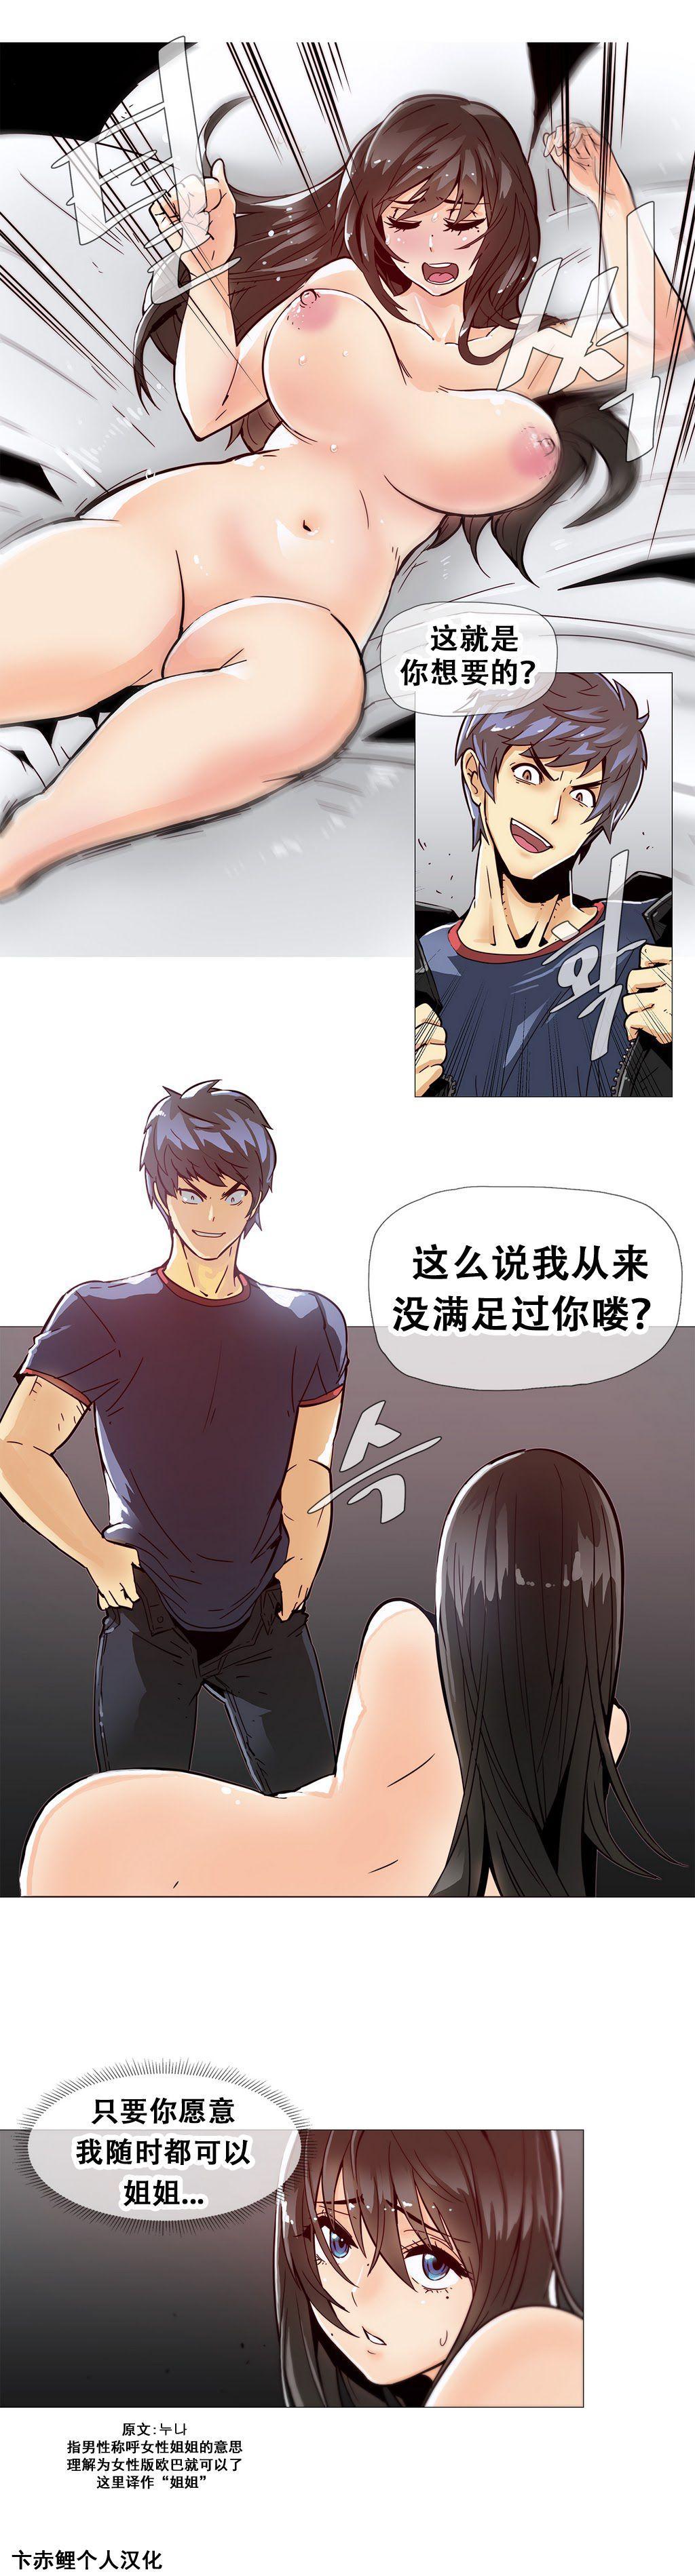 HouseHold Affairs 【卞赤鲤个人汉化】1~21话(持续更新中) 247